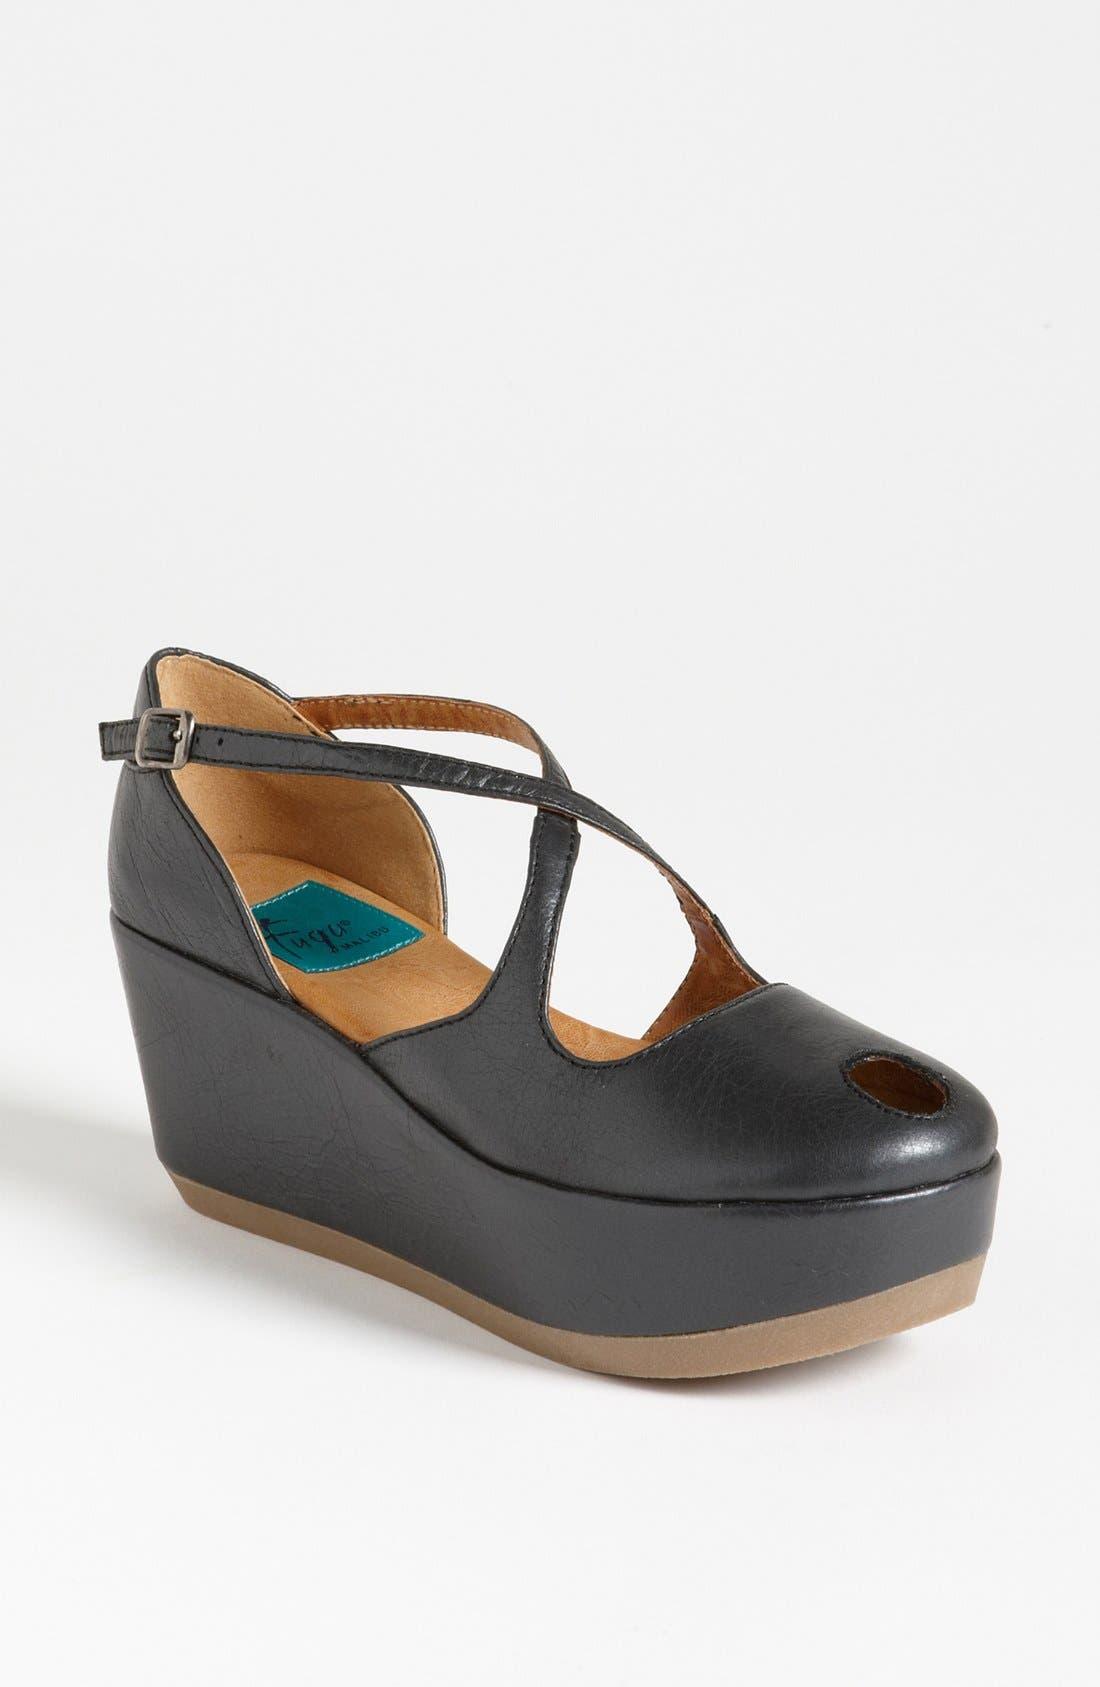 Main Image - Fugu Malibu 'Gansta' Sandal